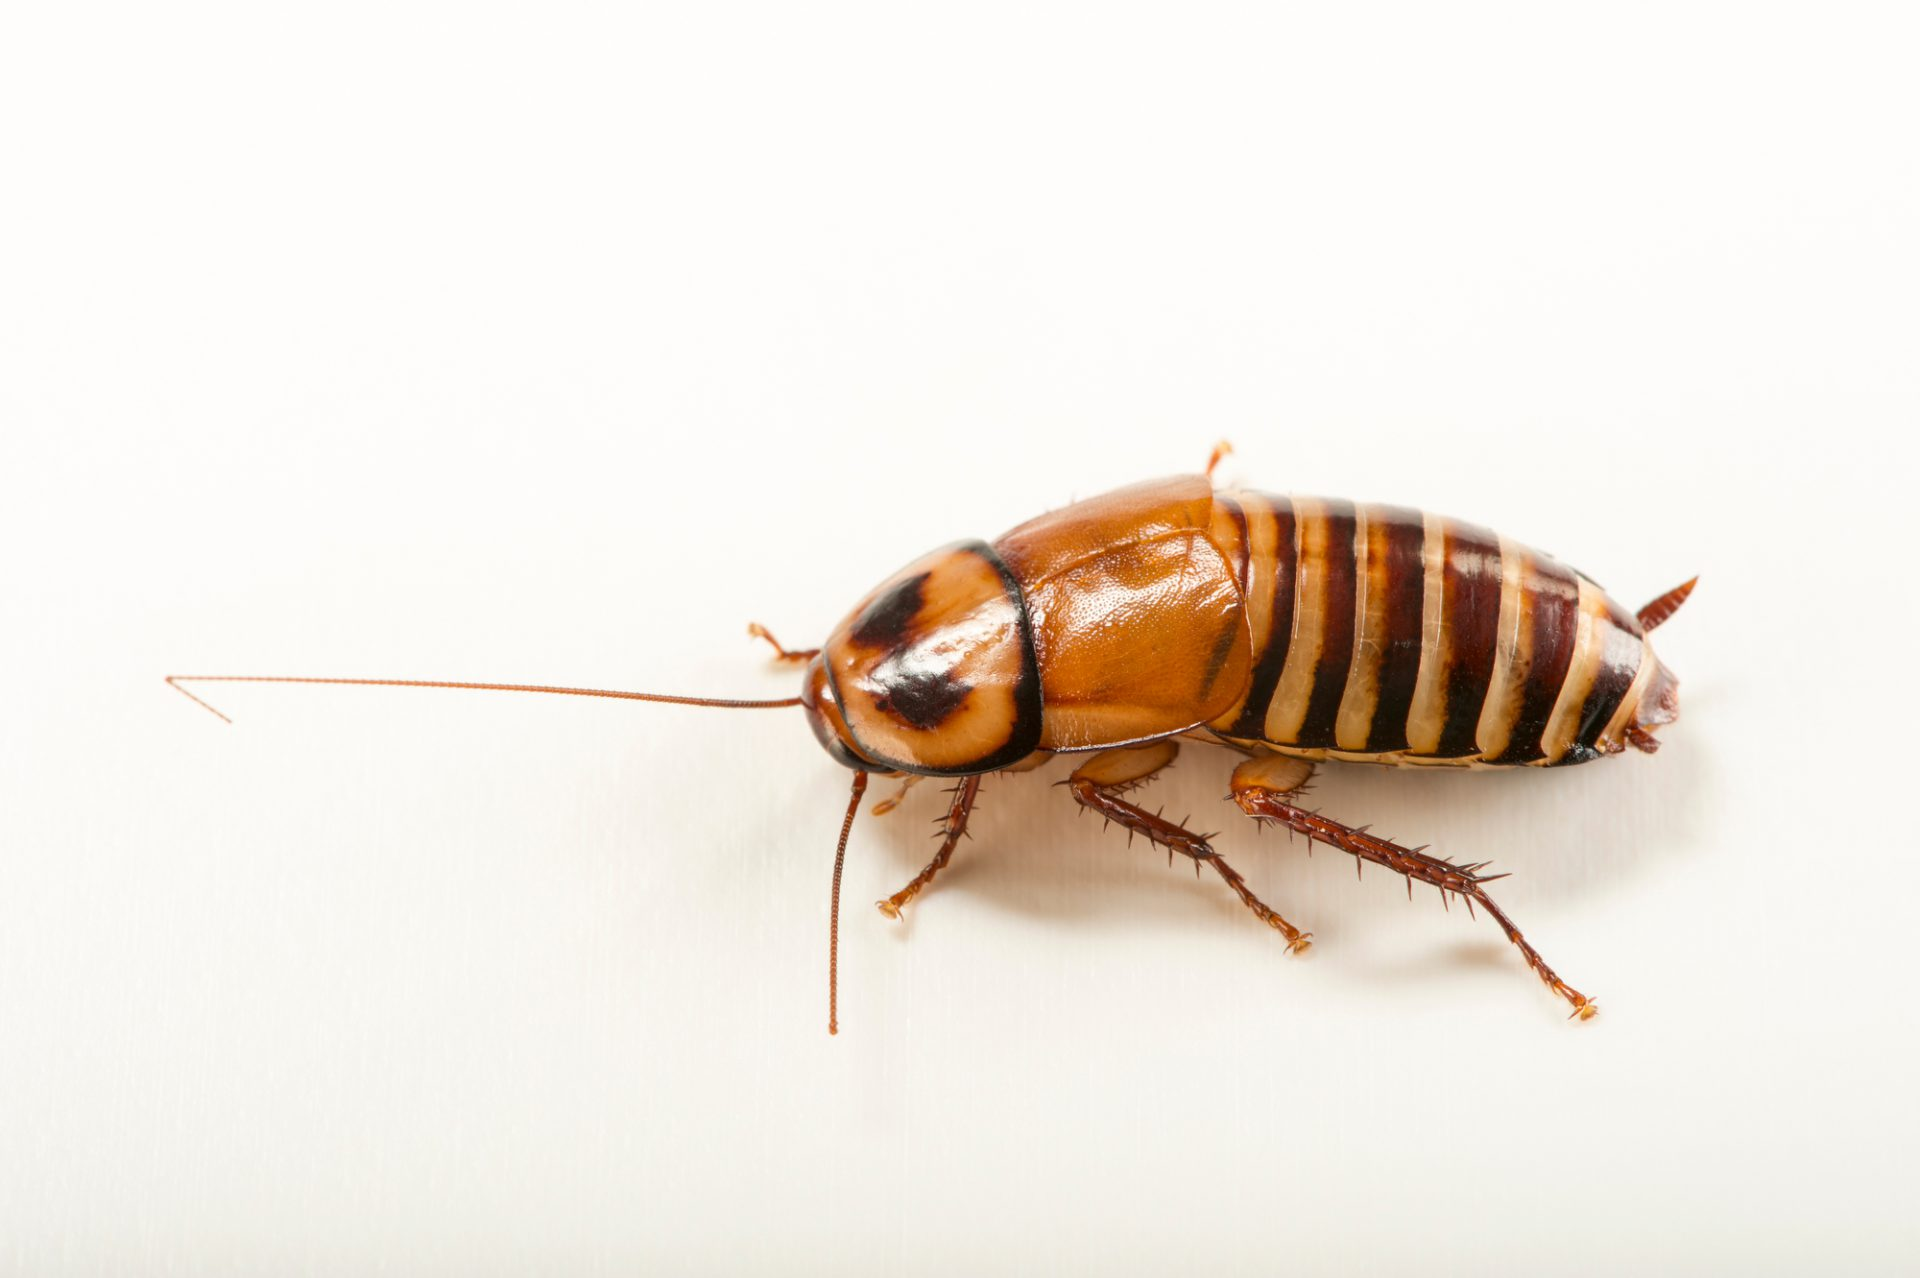 Photo: Zebra cockroach (Eurycotis decipiens) at the Budapest Zoo.